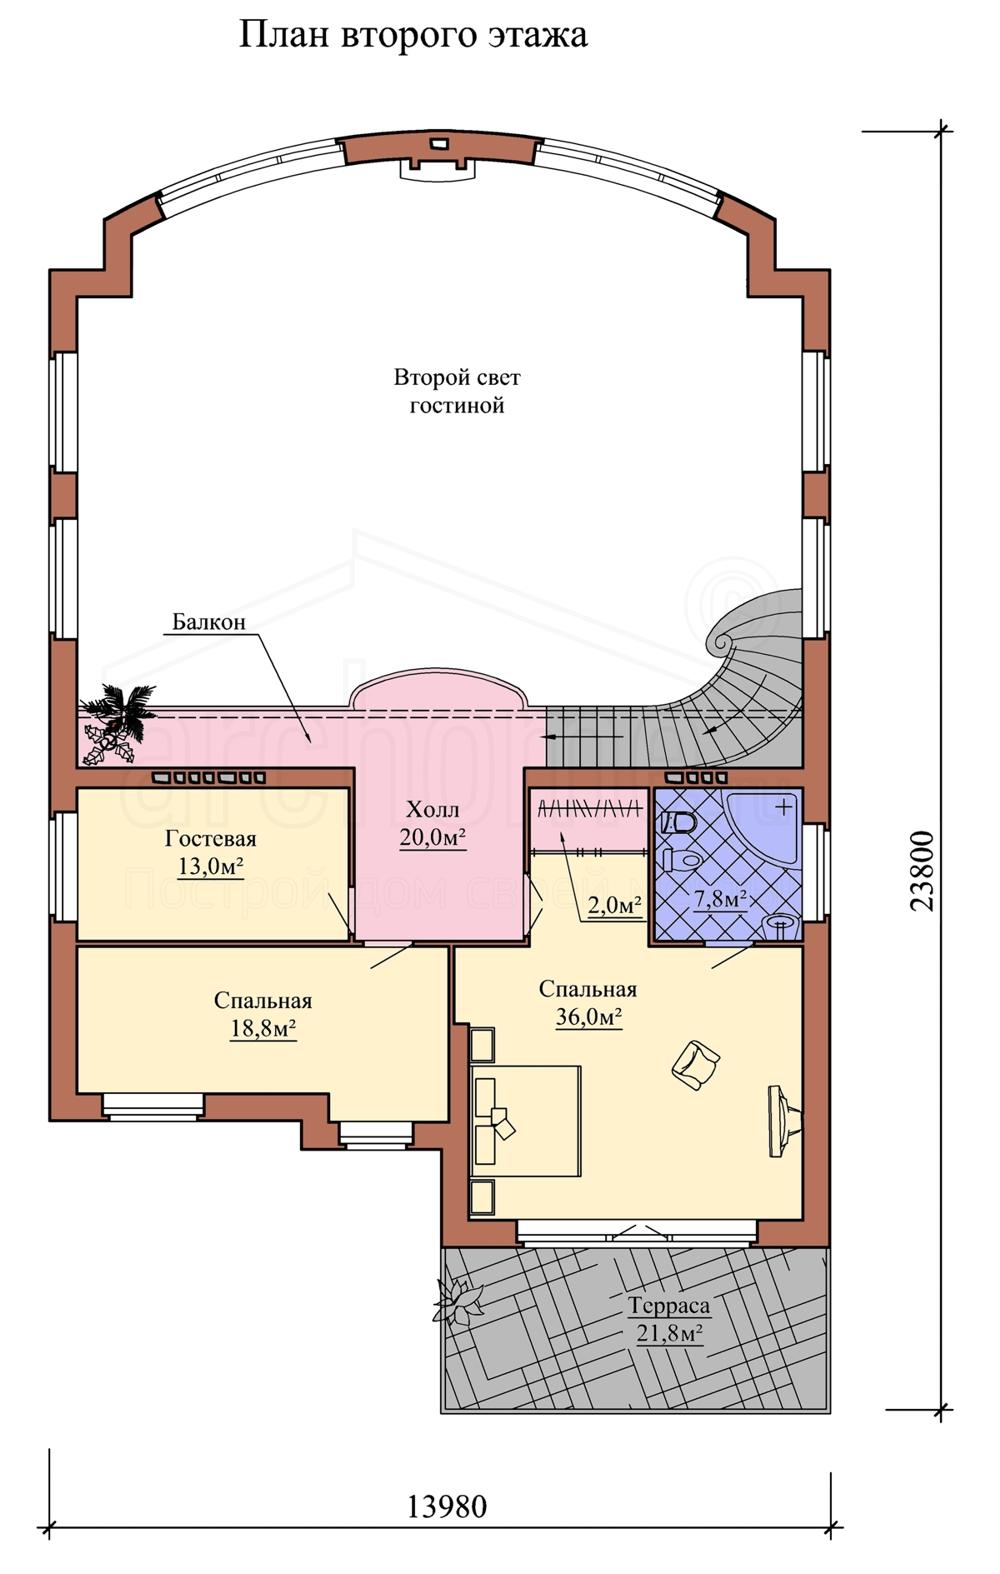 Планы этажей проекта МОНРО 2